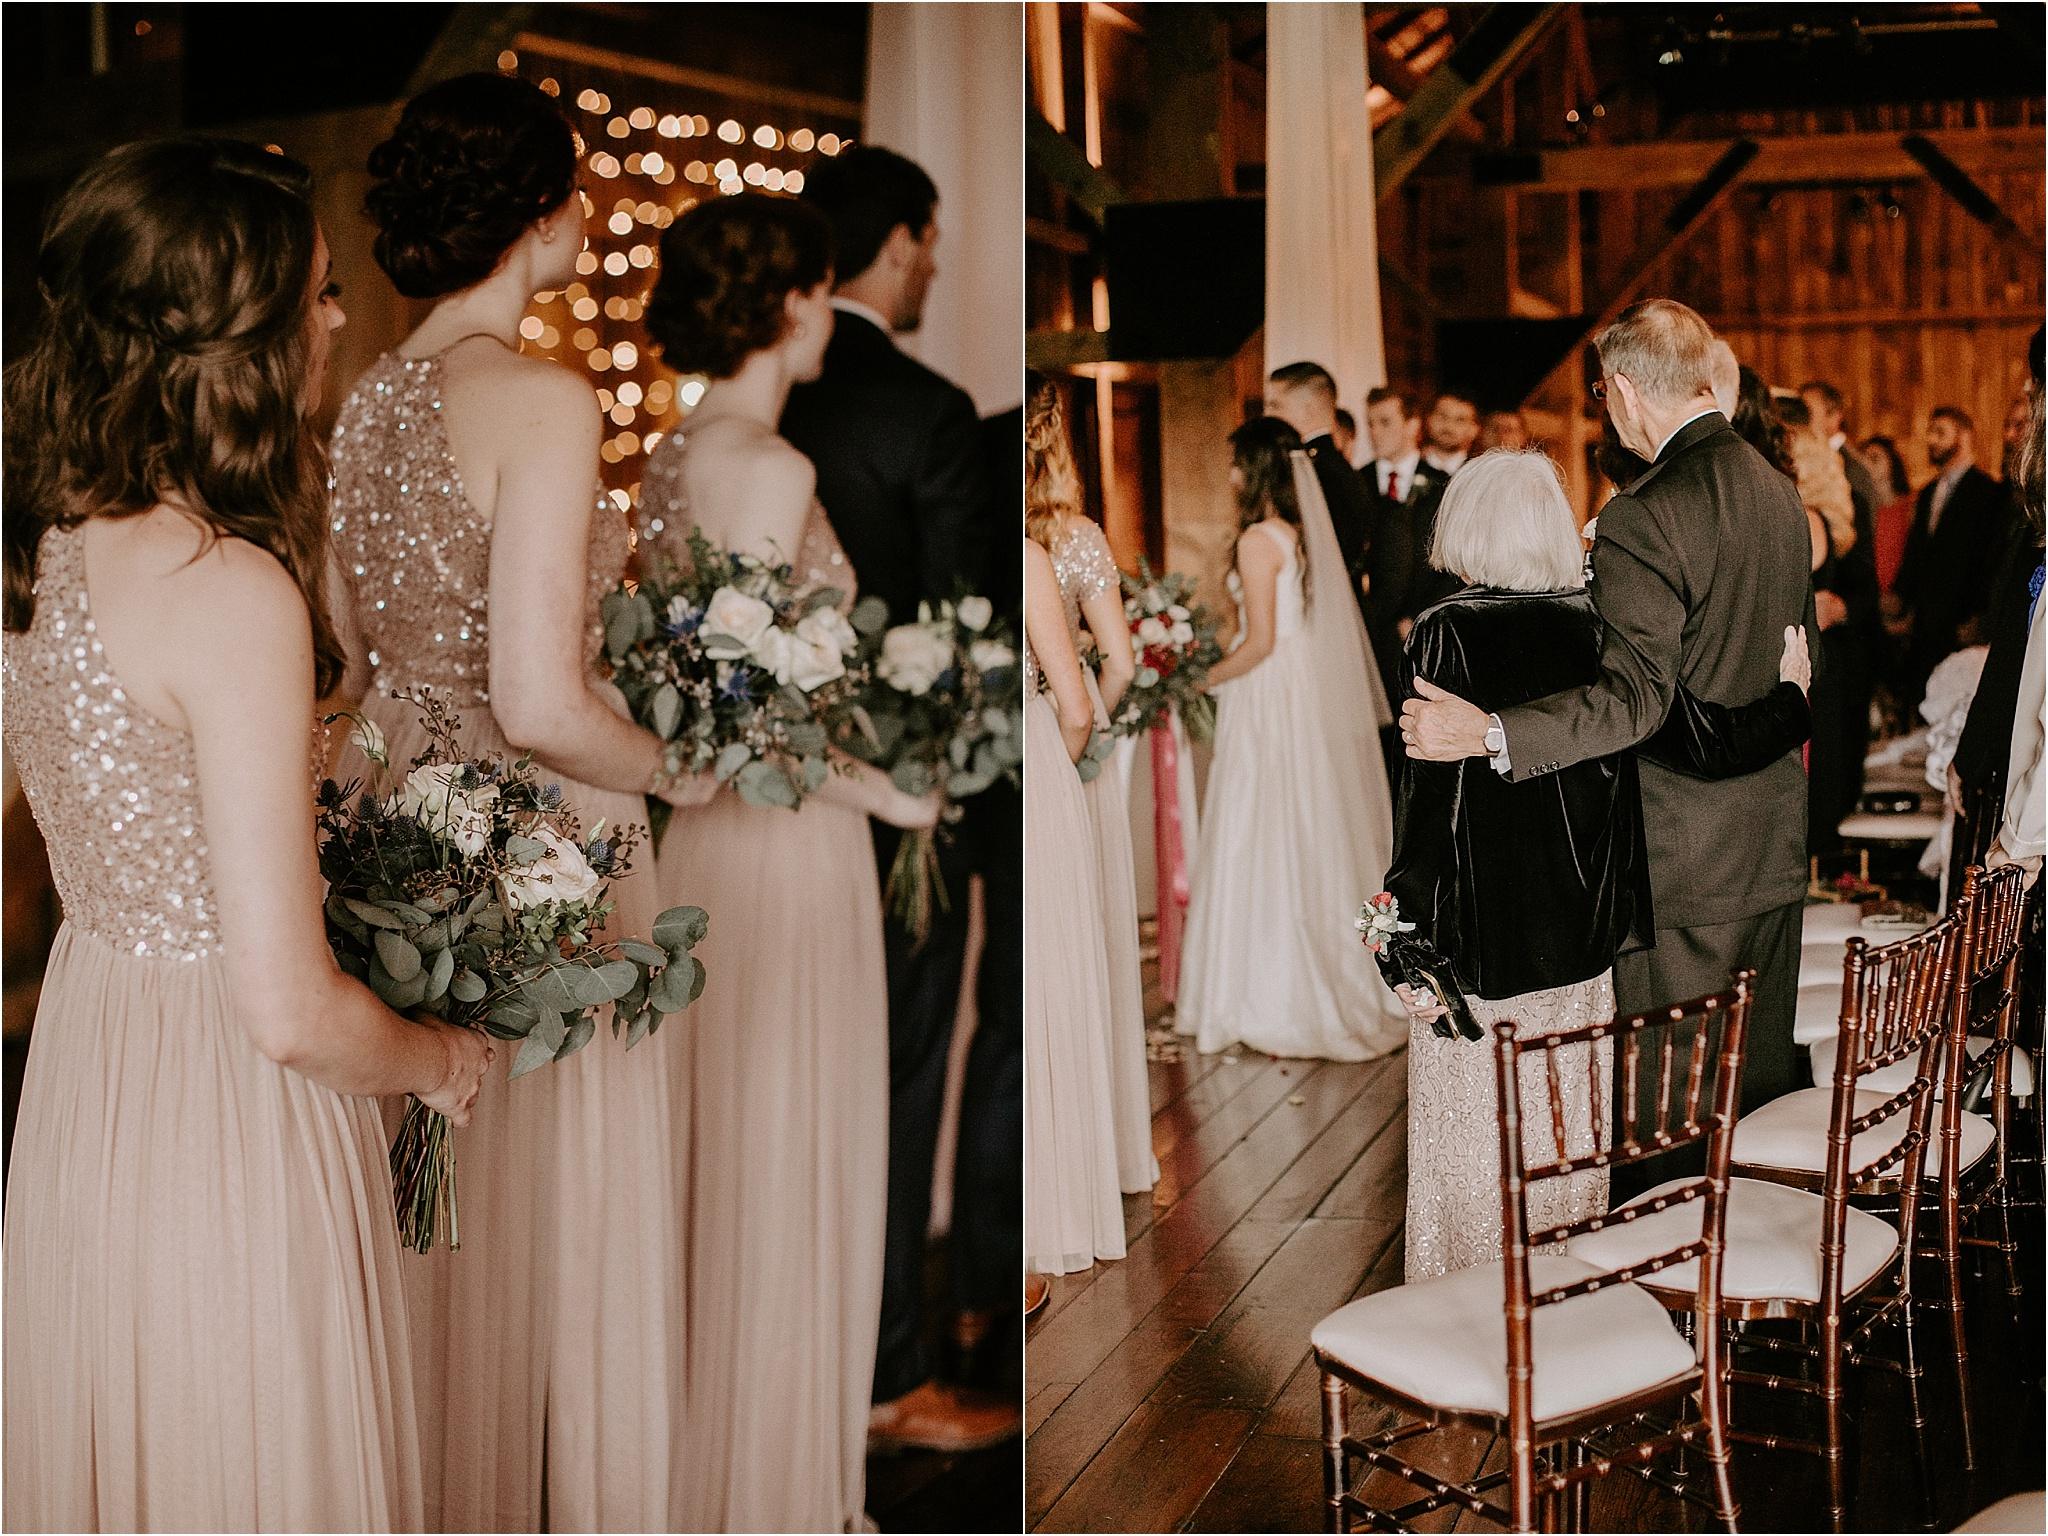 Sarah_Brookhart_Farm_at_Eagles_Ridge_Wedding_Photographer_0045.jpg